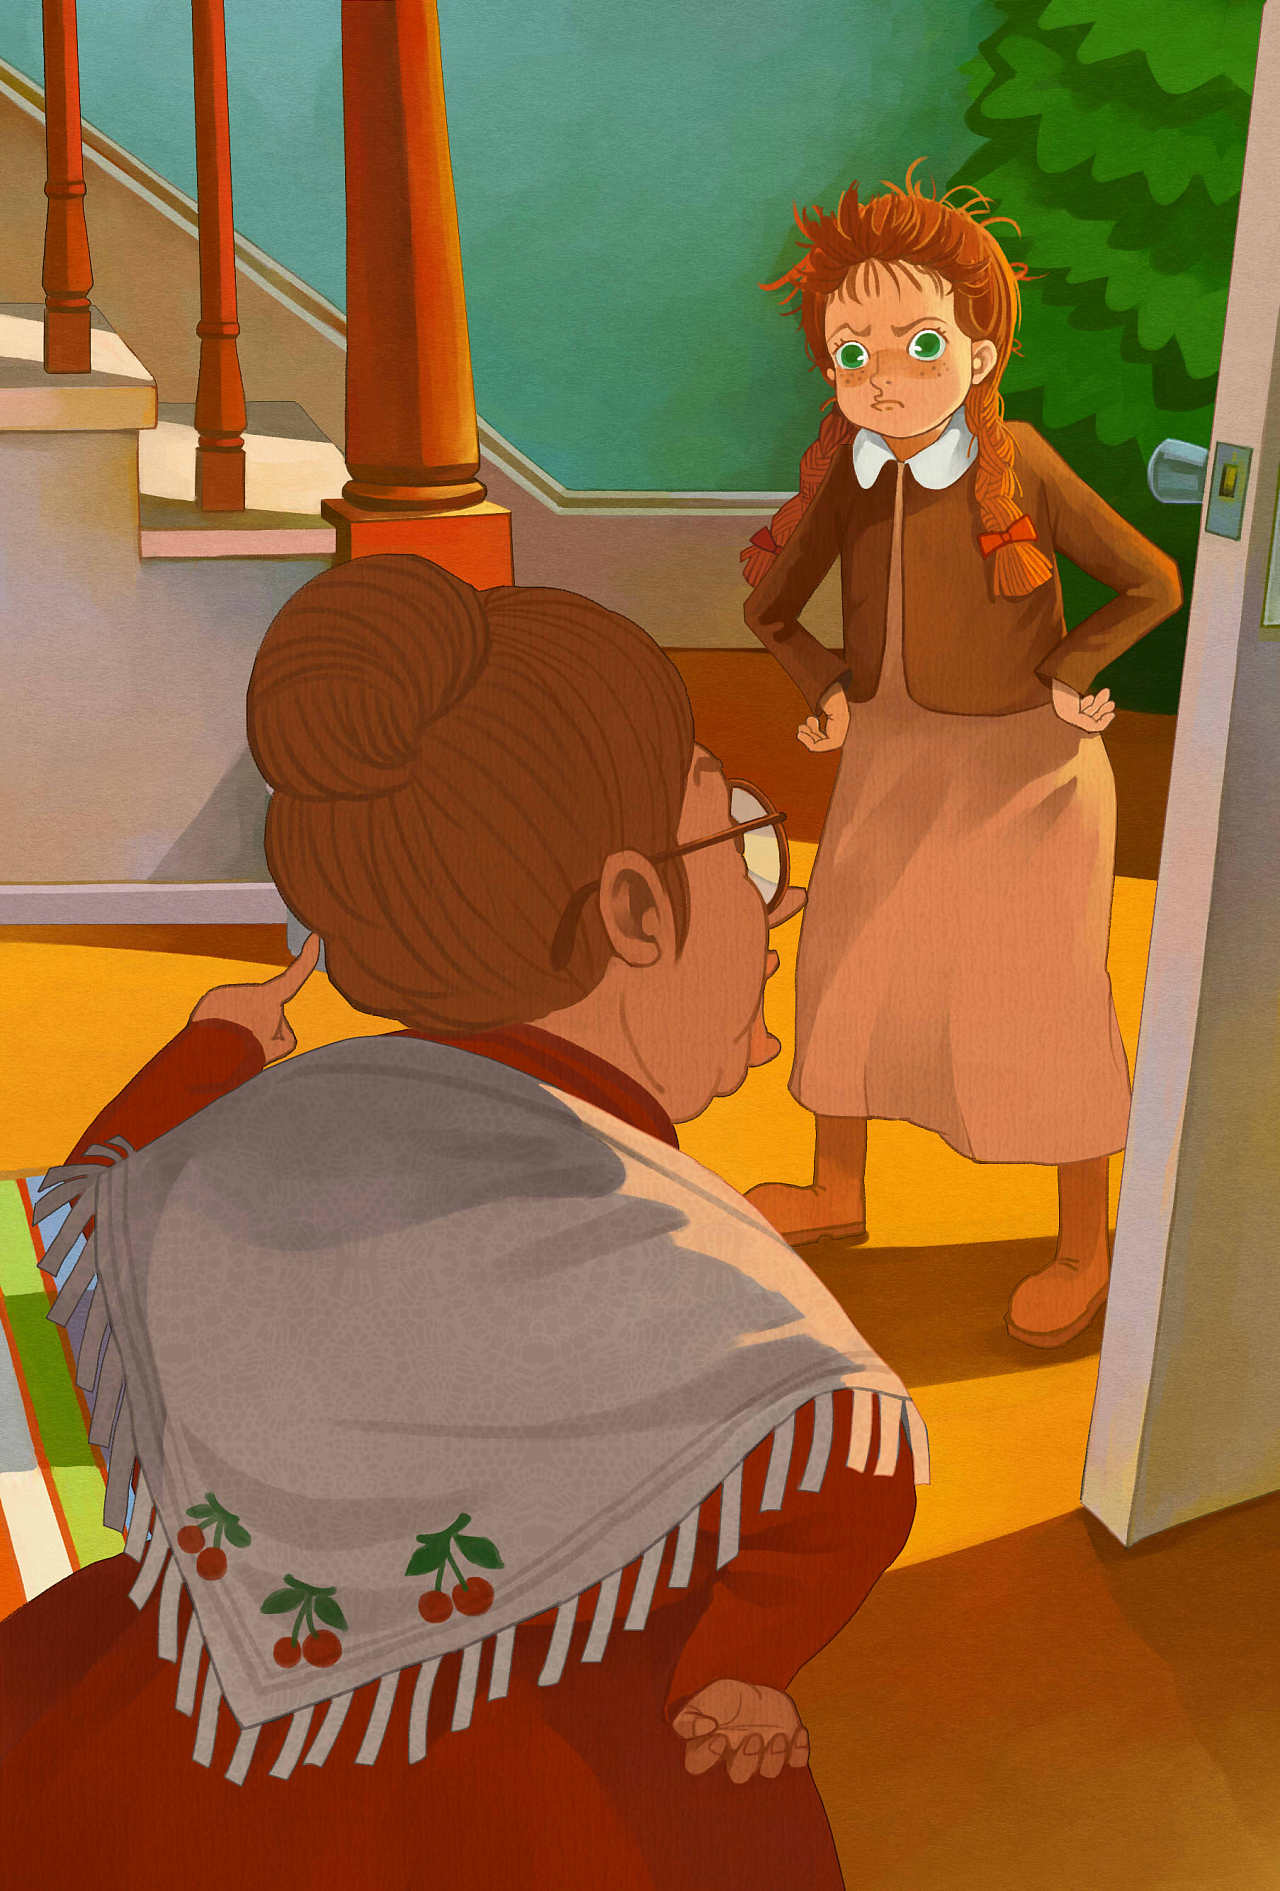 绿山墙的安妮 Anne of Green Gables 系列插图全